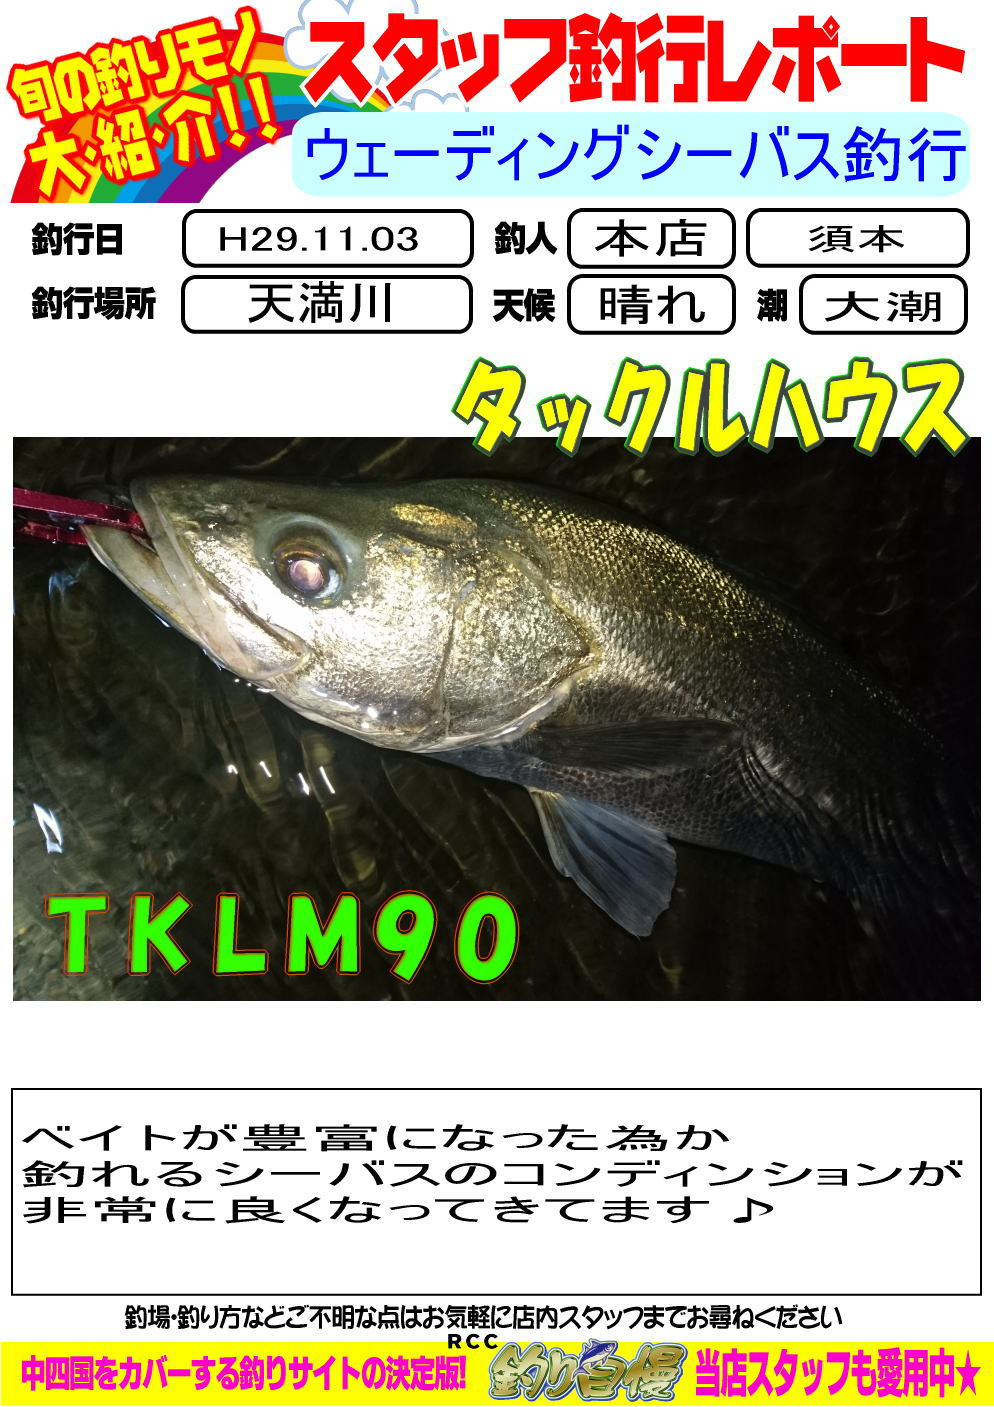 http://www.e-angle.co.jp/shop/blog/H29.11.04.jpg